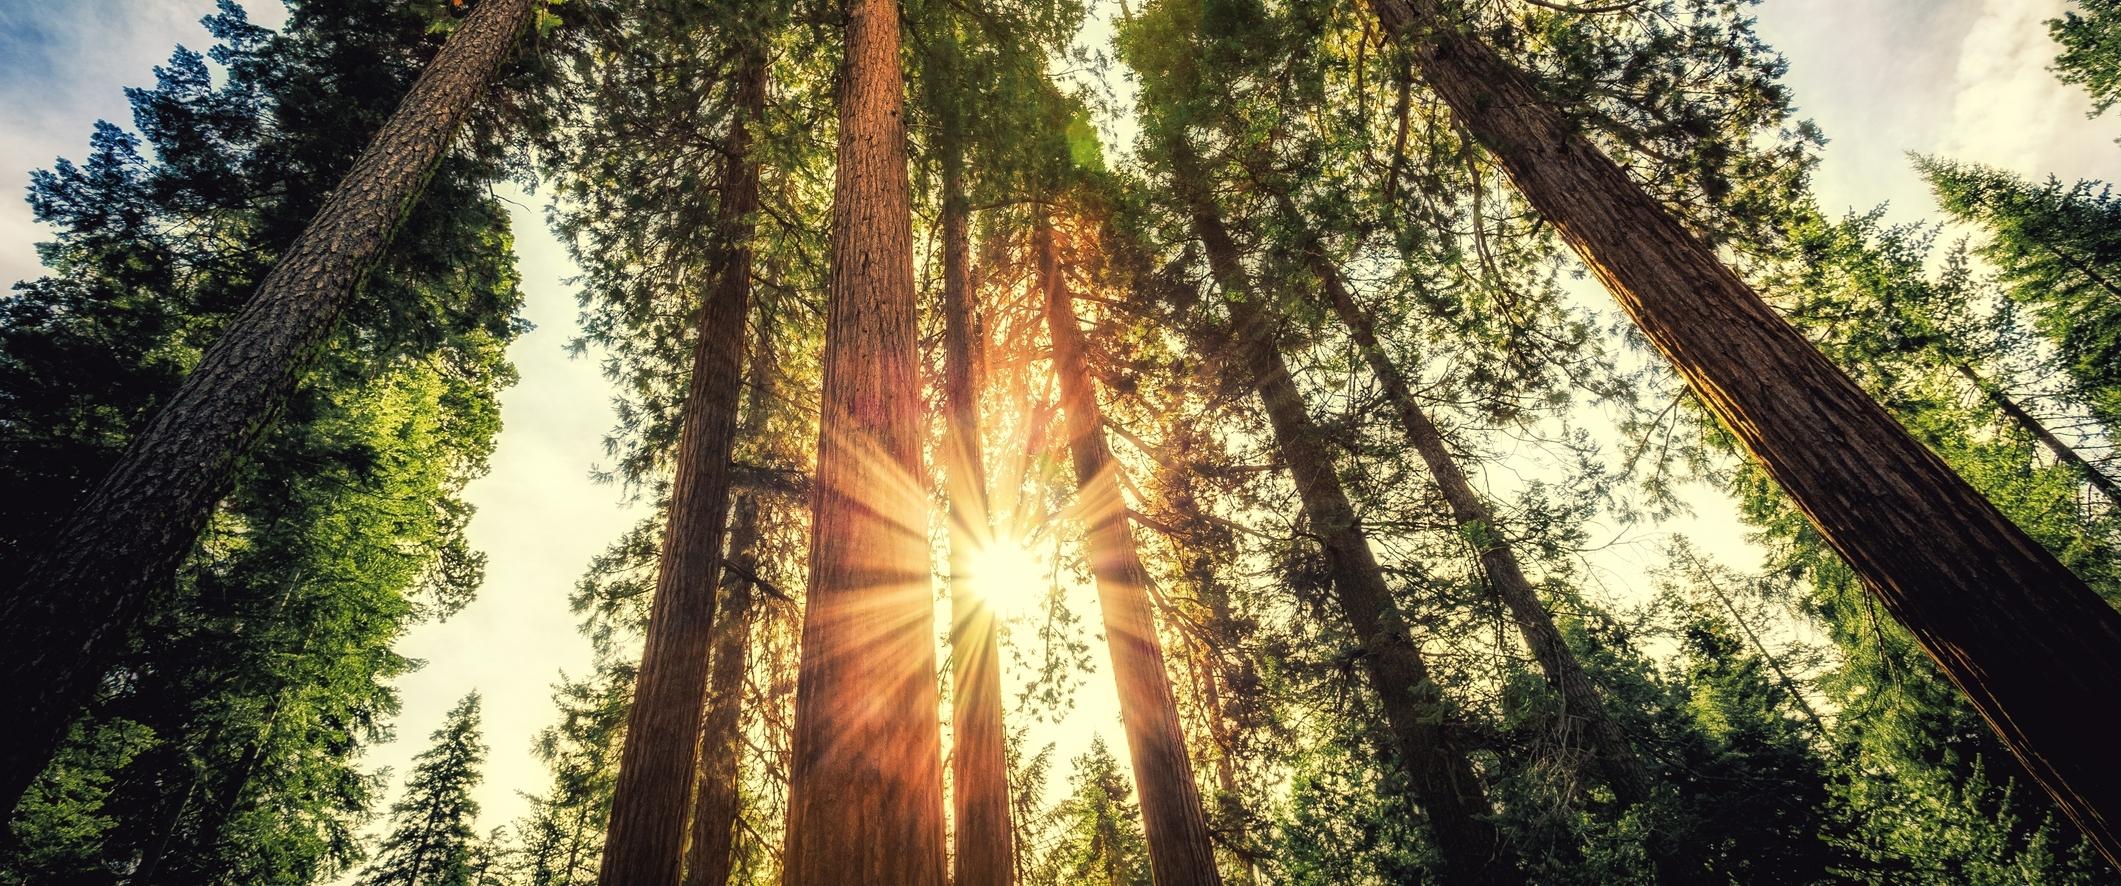 welcome trees.jpg